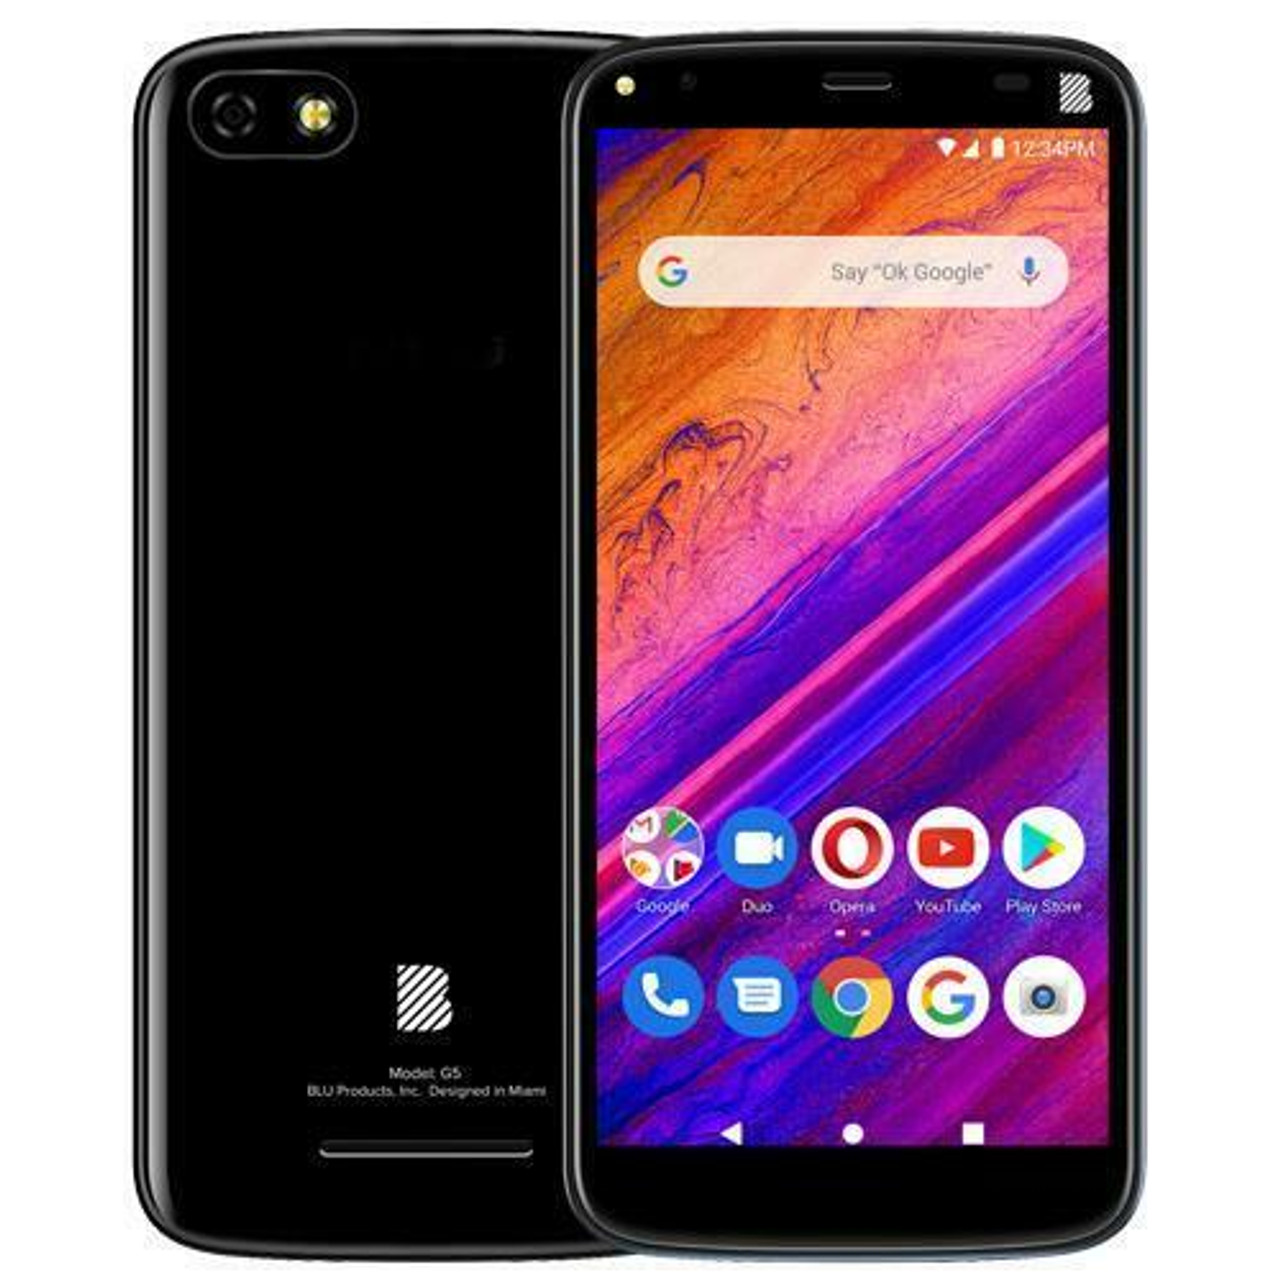 BLU G5 G0090UU Black Smartphone Android